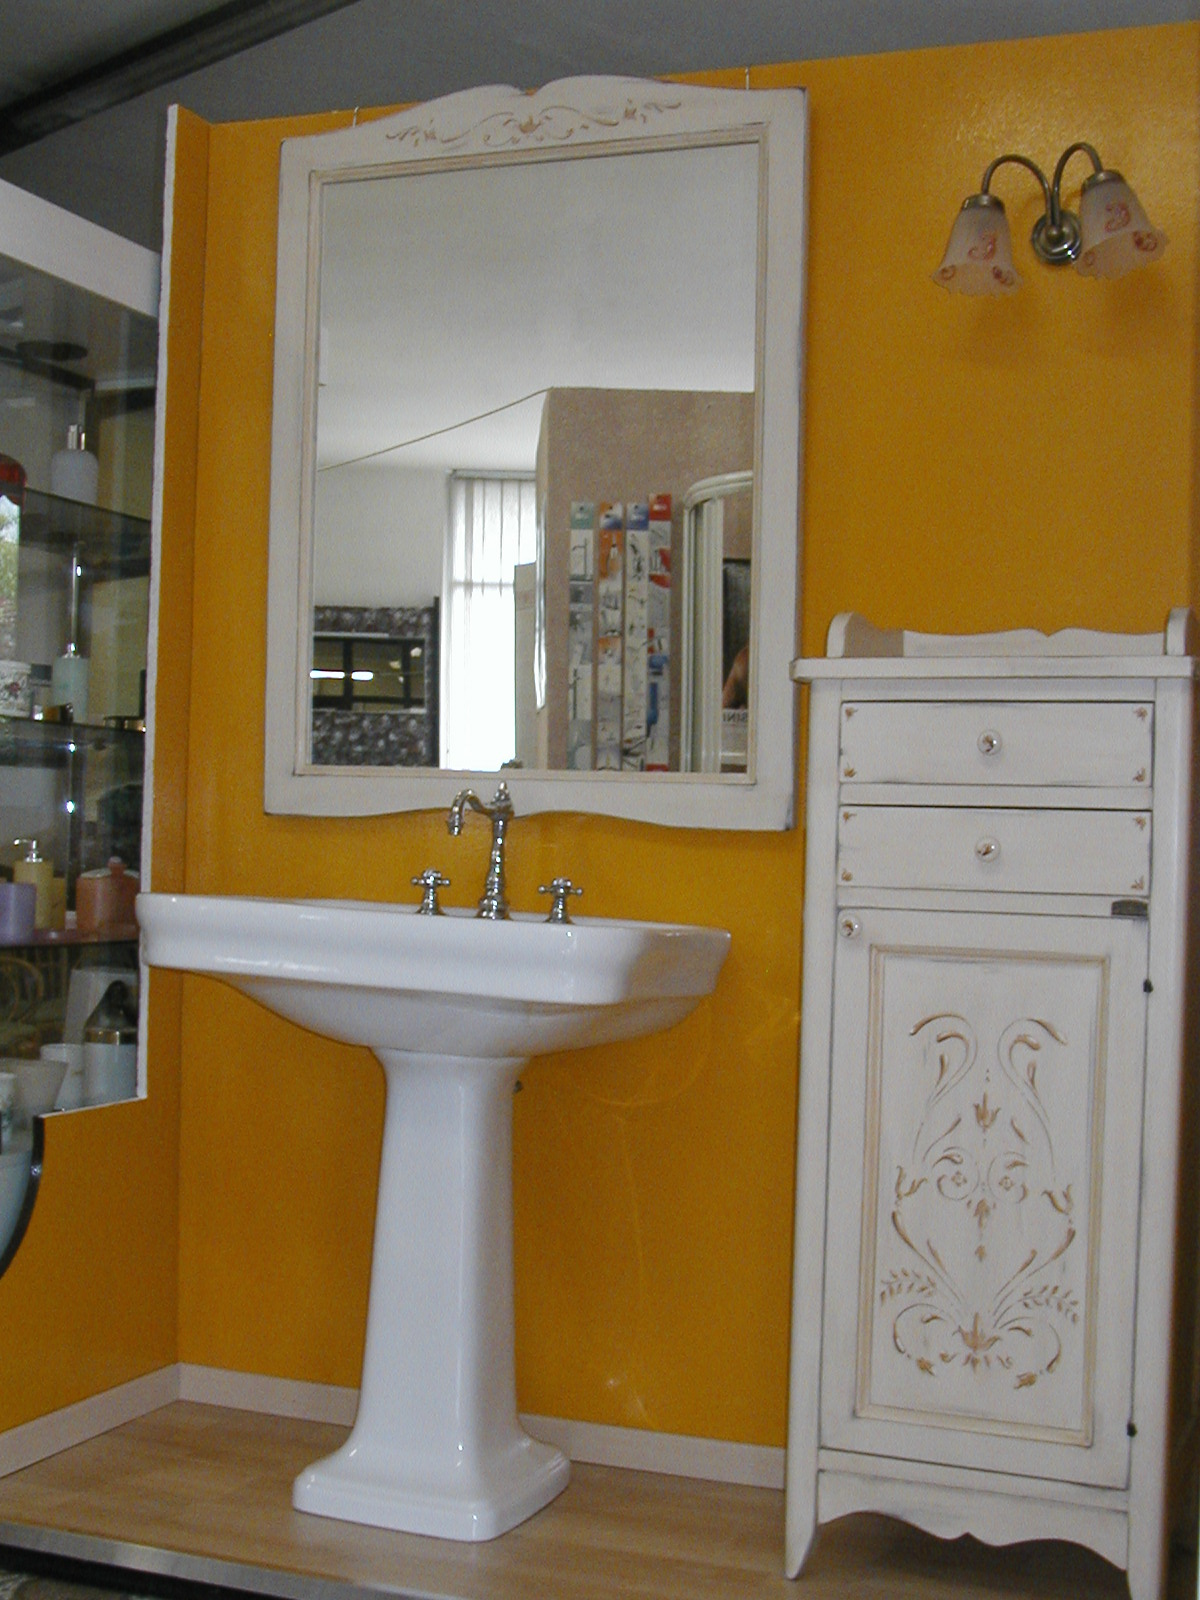 Idraulica Pelamatti - MOBILI DA BAGNO OFFERTA show room Outlet ...